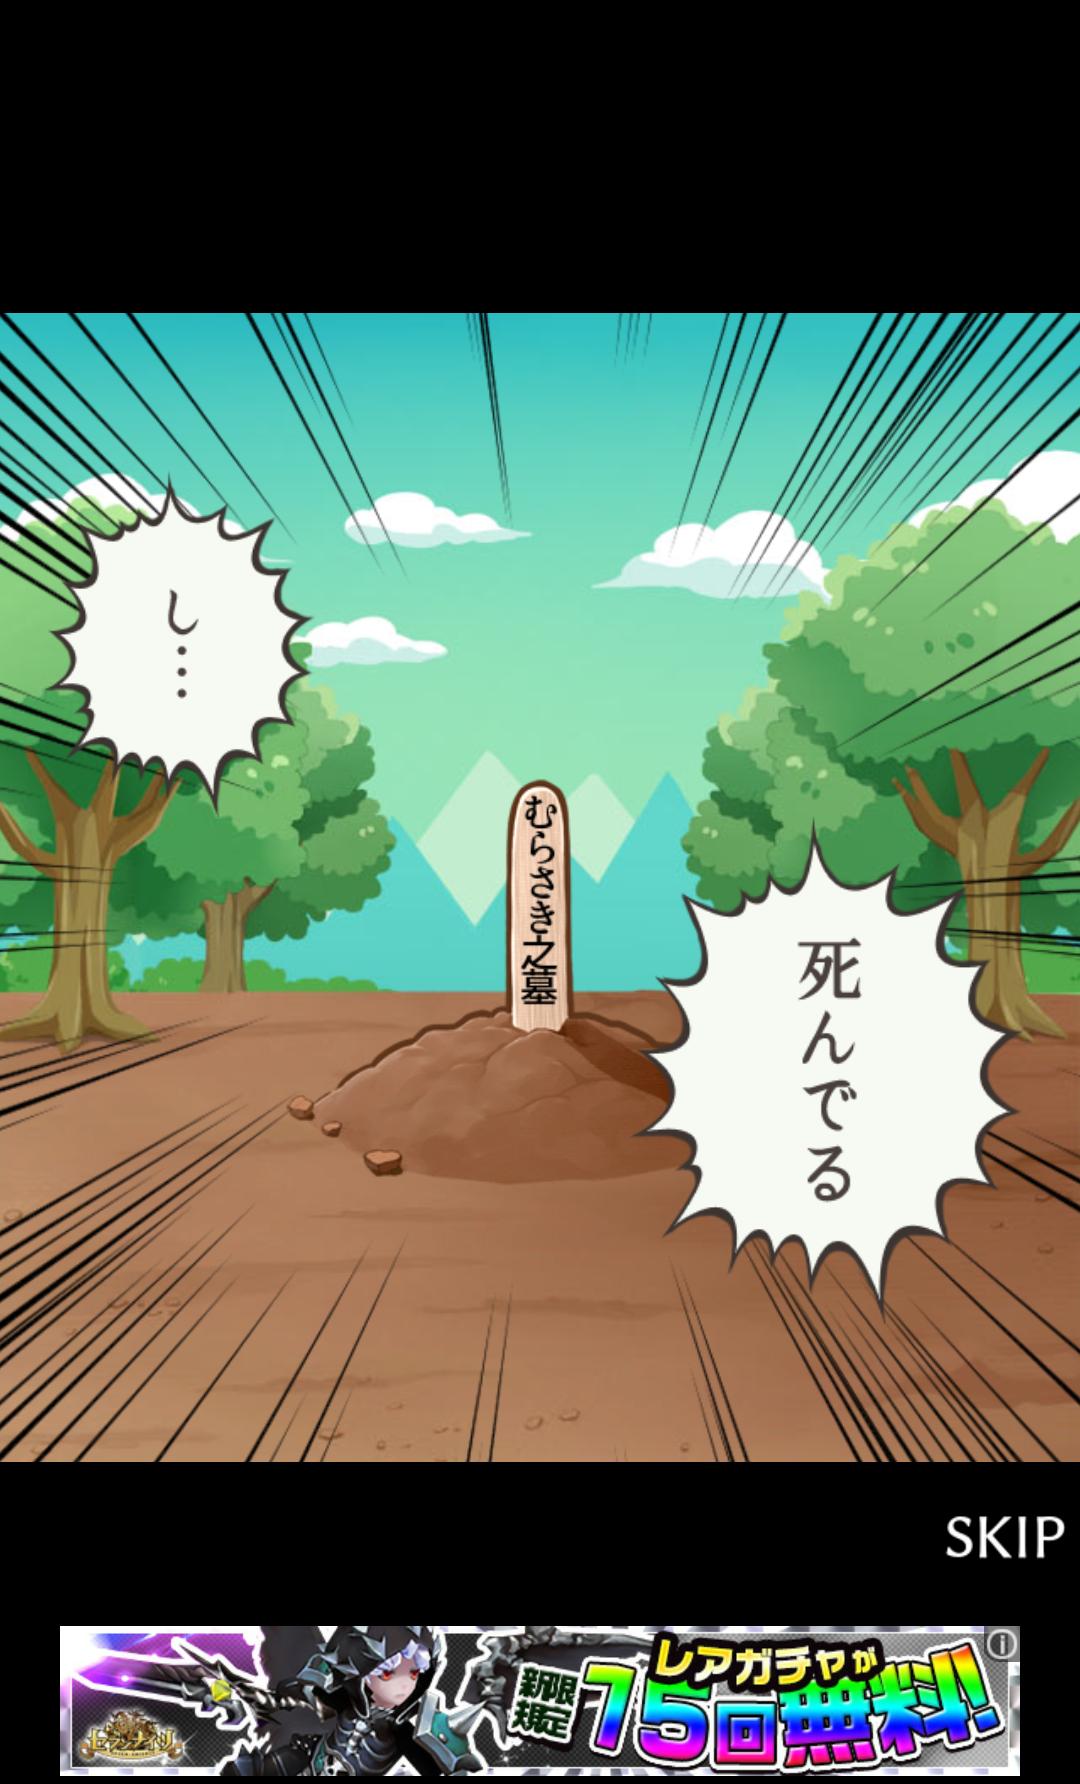 androidアプリ ここに墓を建てよう攻略スクリーンショット2